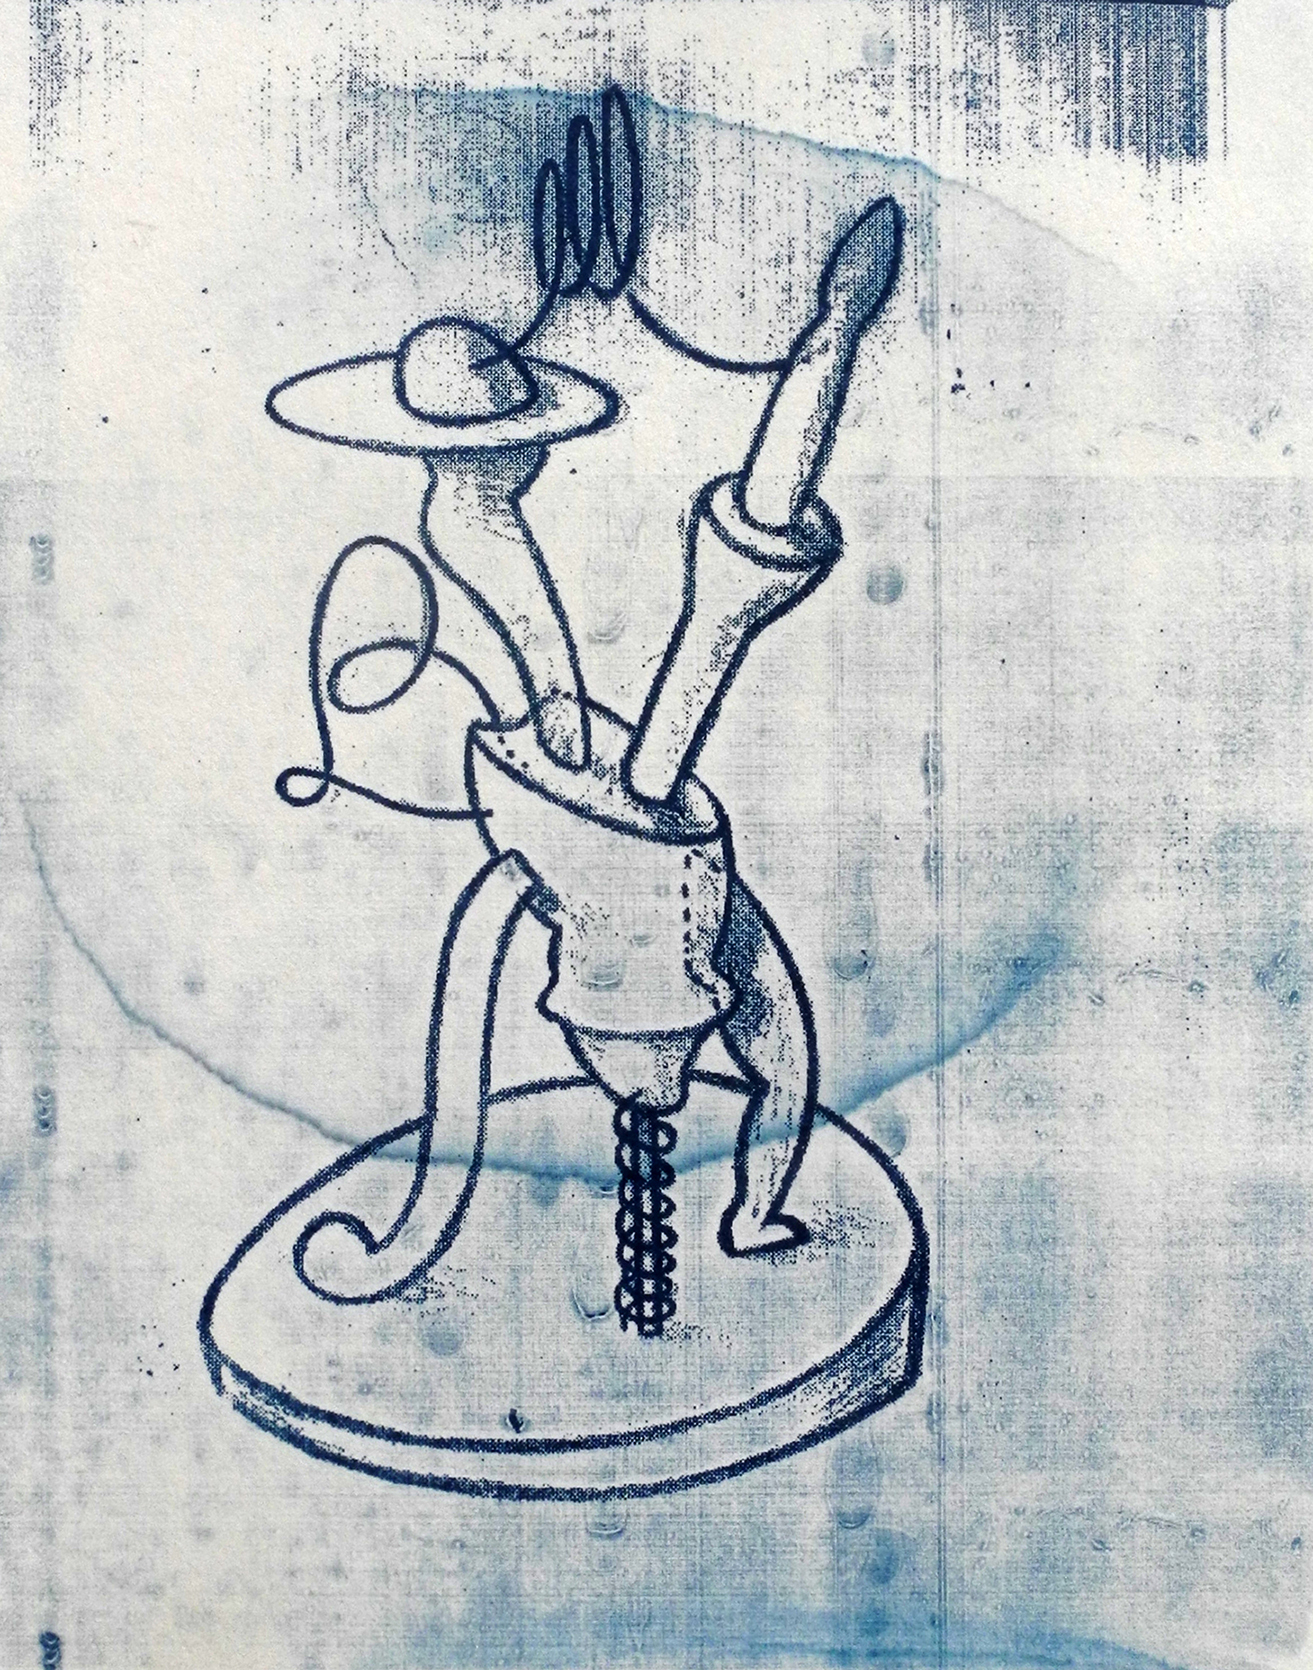 D. Dominick Lombardi, Auguste's Brain